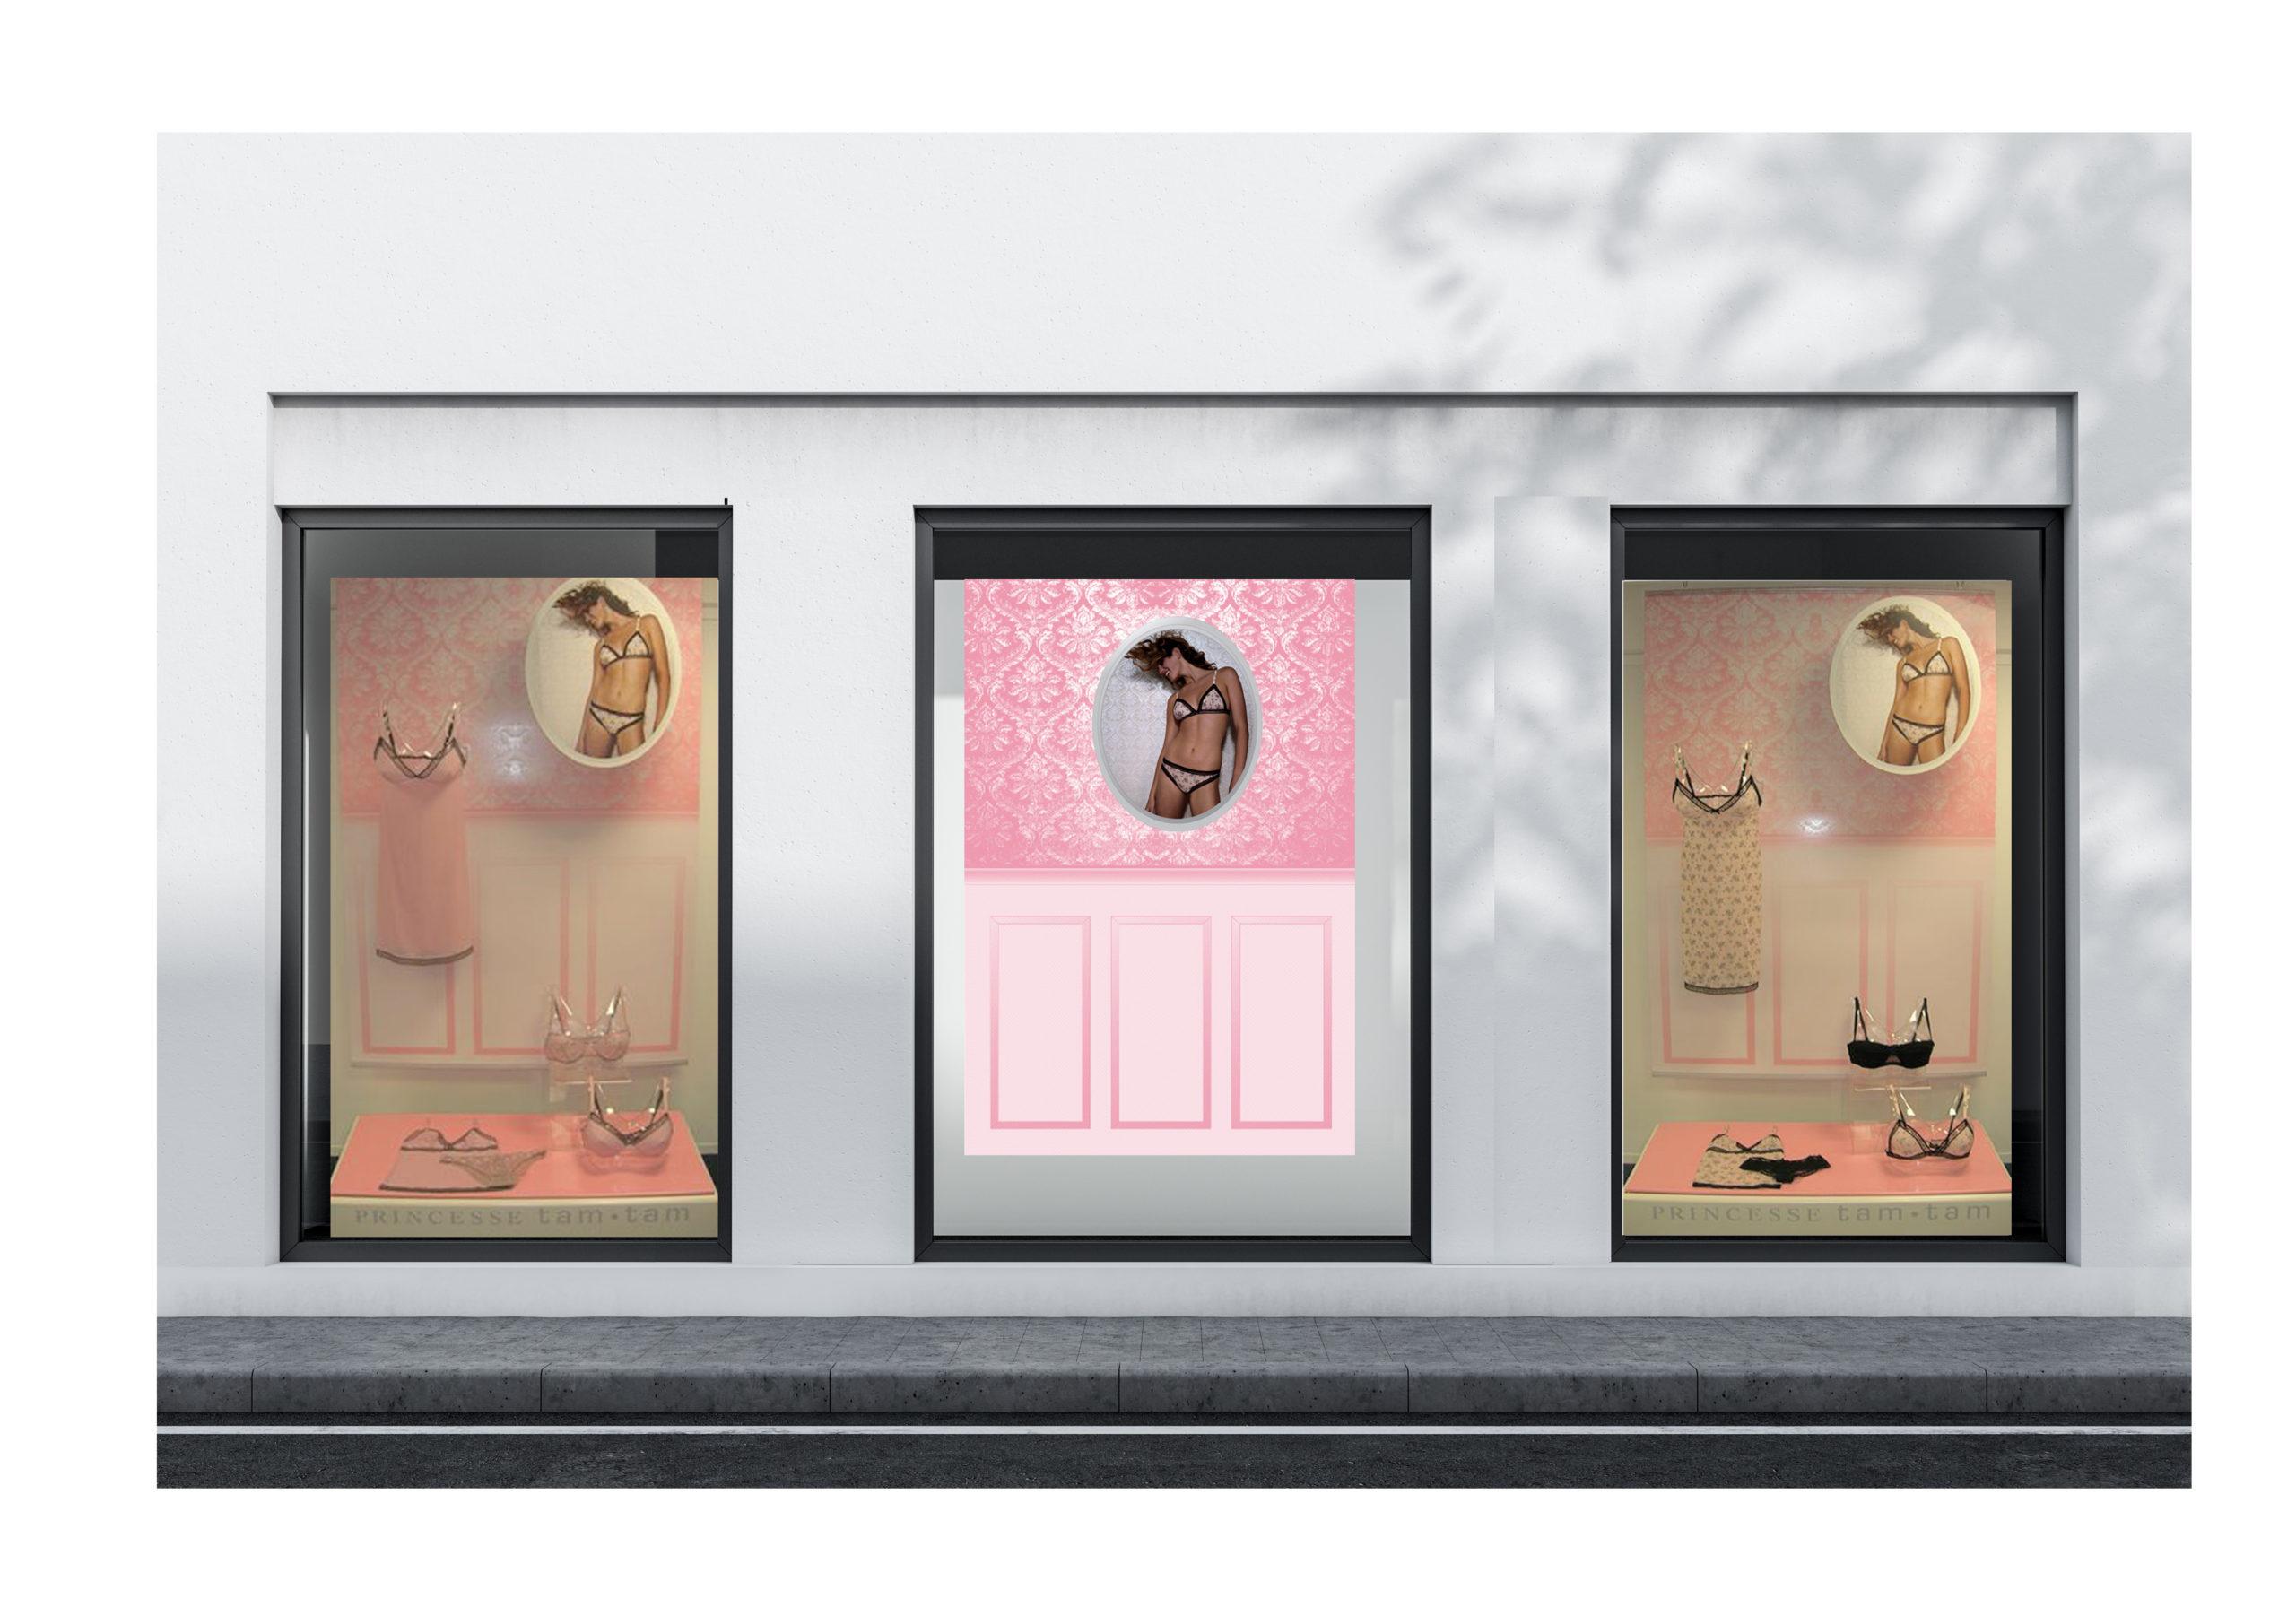 merchandising vitrine princesse tam tam Chic Studio